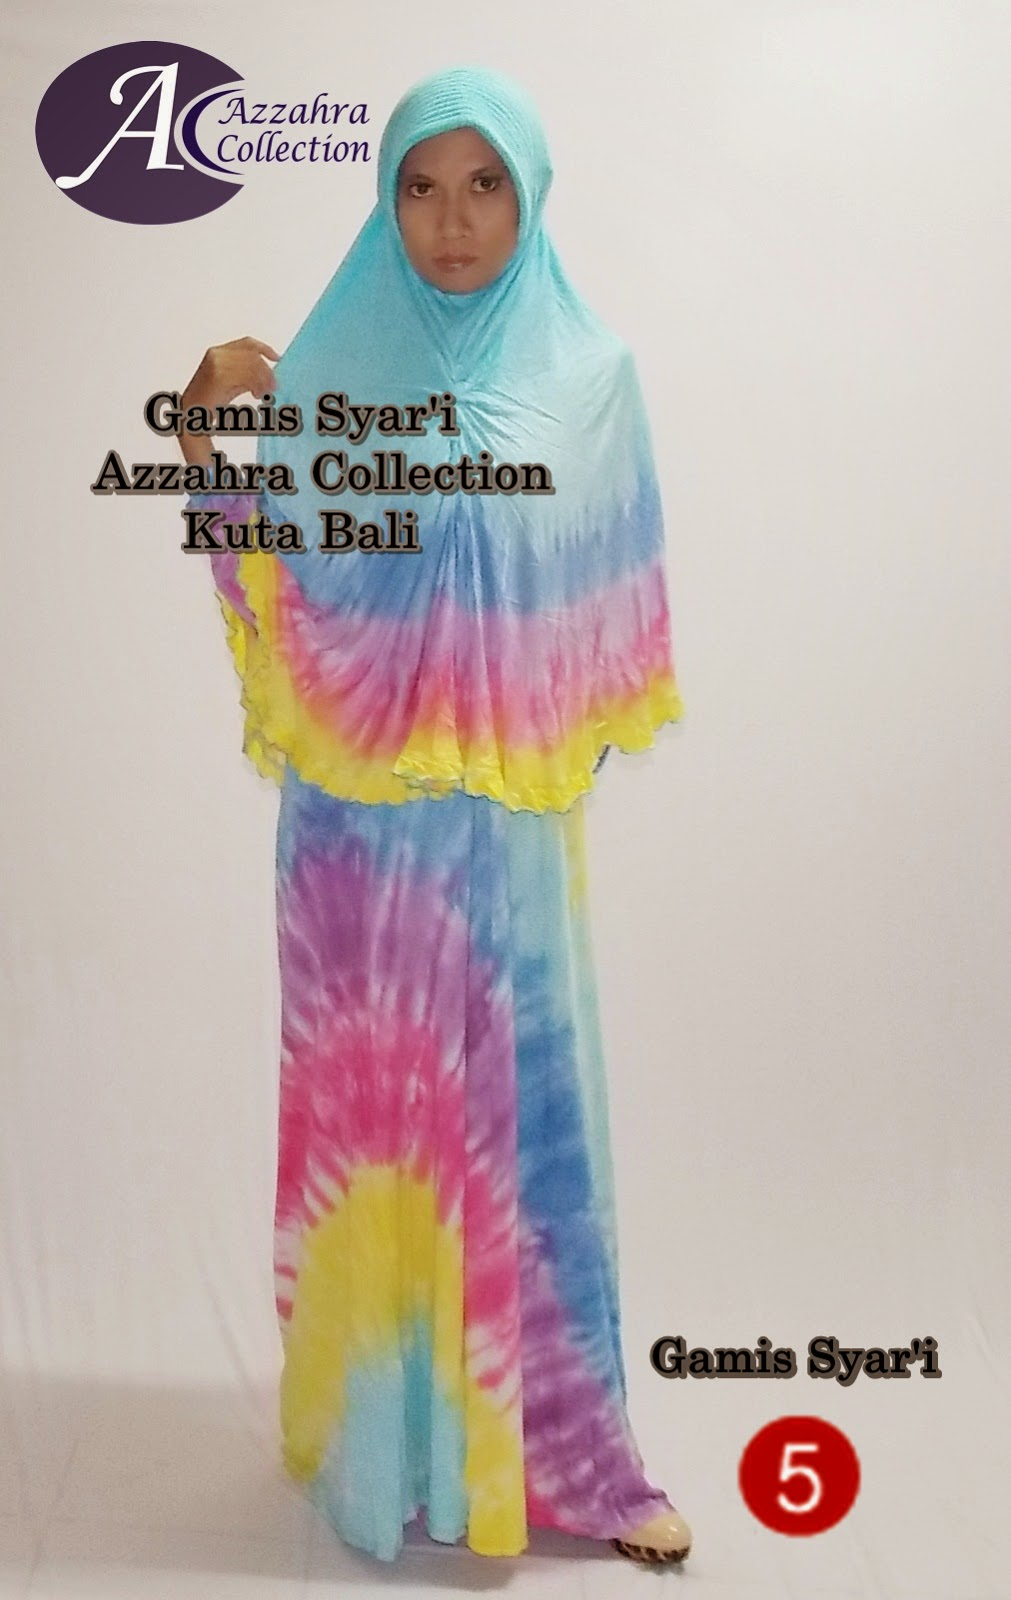 Gamis Syar'i full Tie-dye